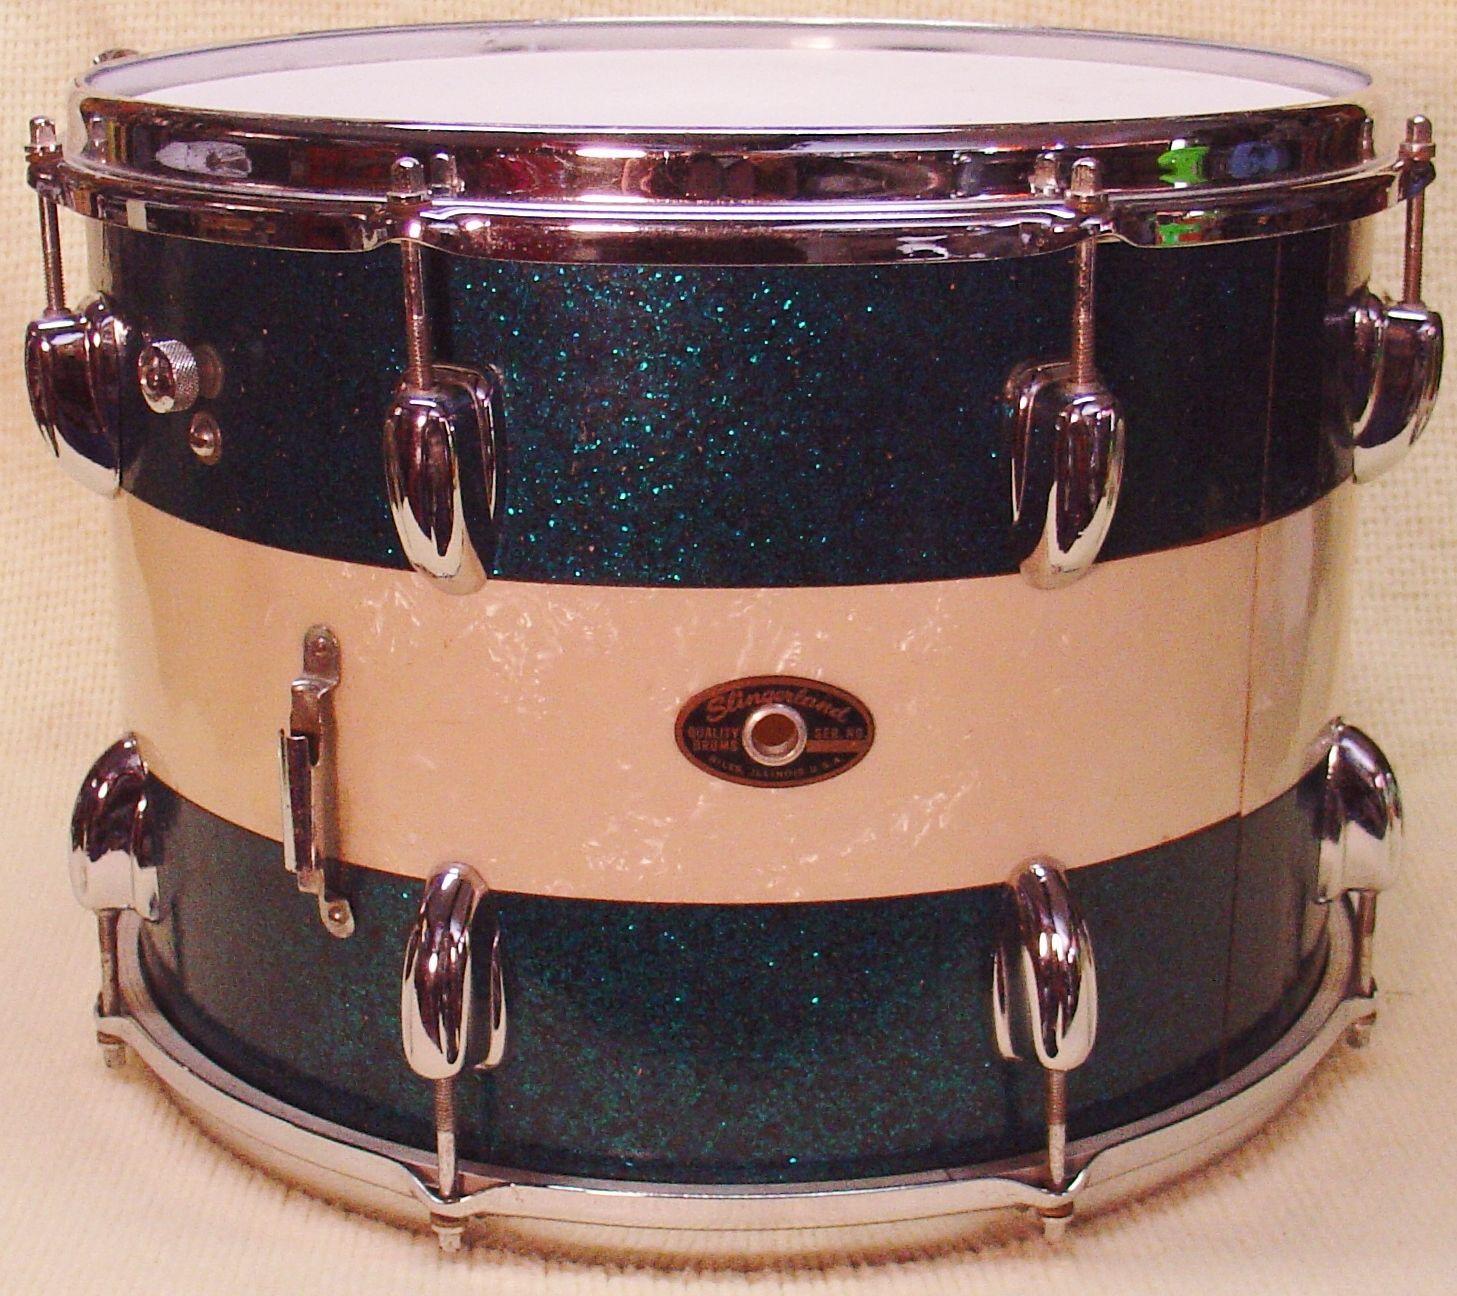 1965 Slingerland 10 X 14 Tenor Tom Aqua Blue Sparkle White Marine Ebay Percussion Instruments Vintage Drums Blue Sparkles